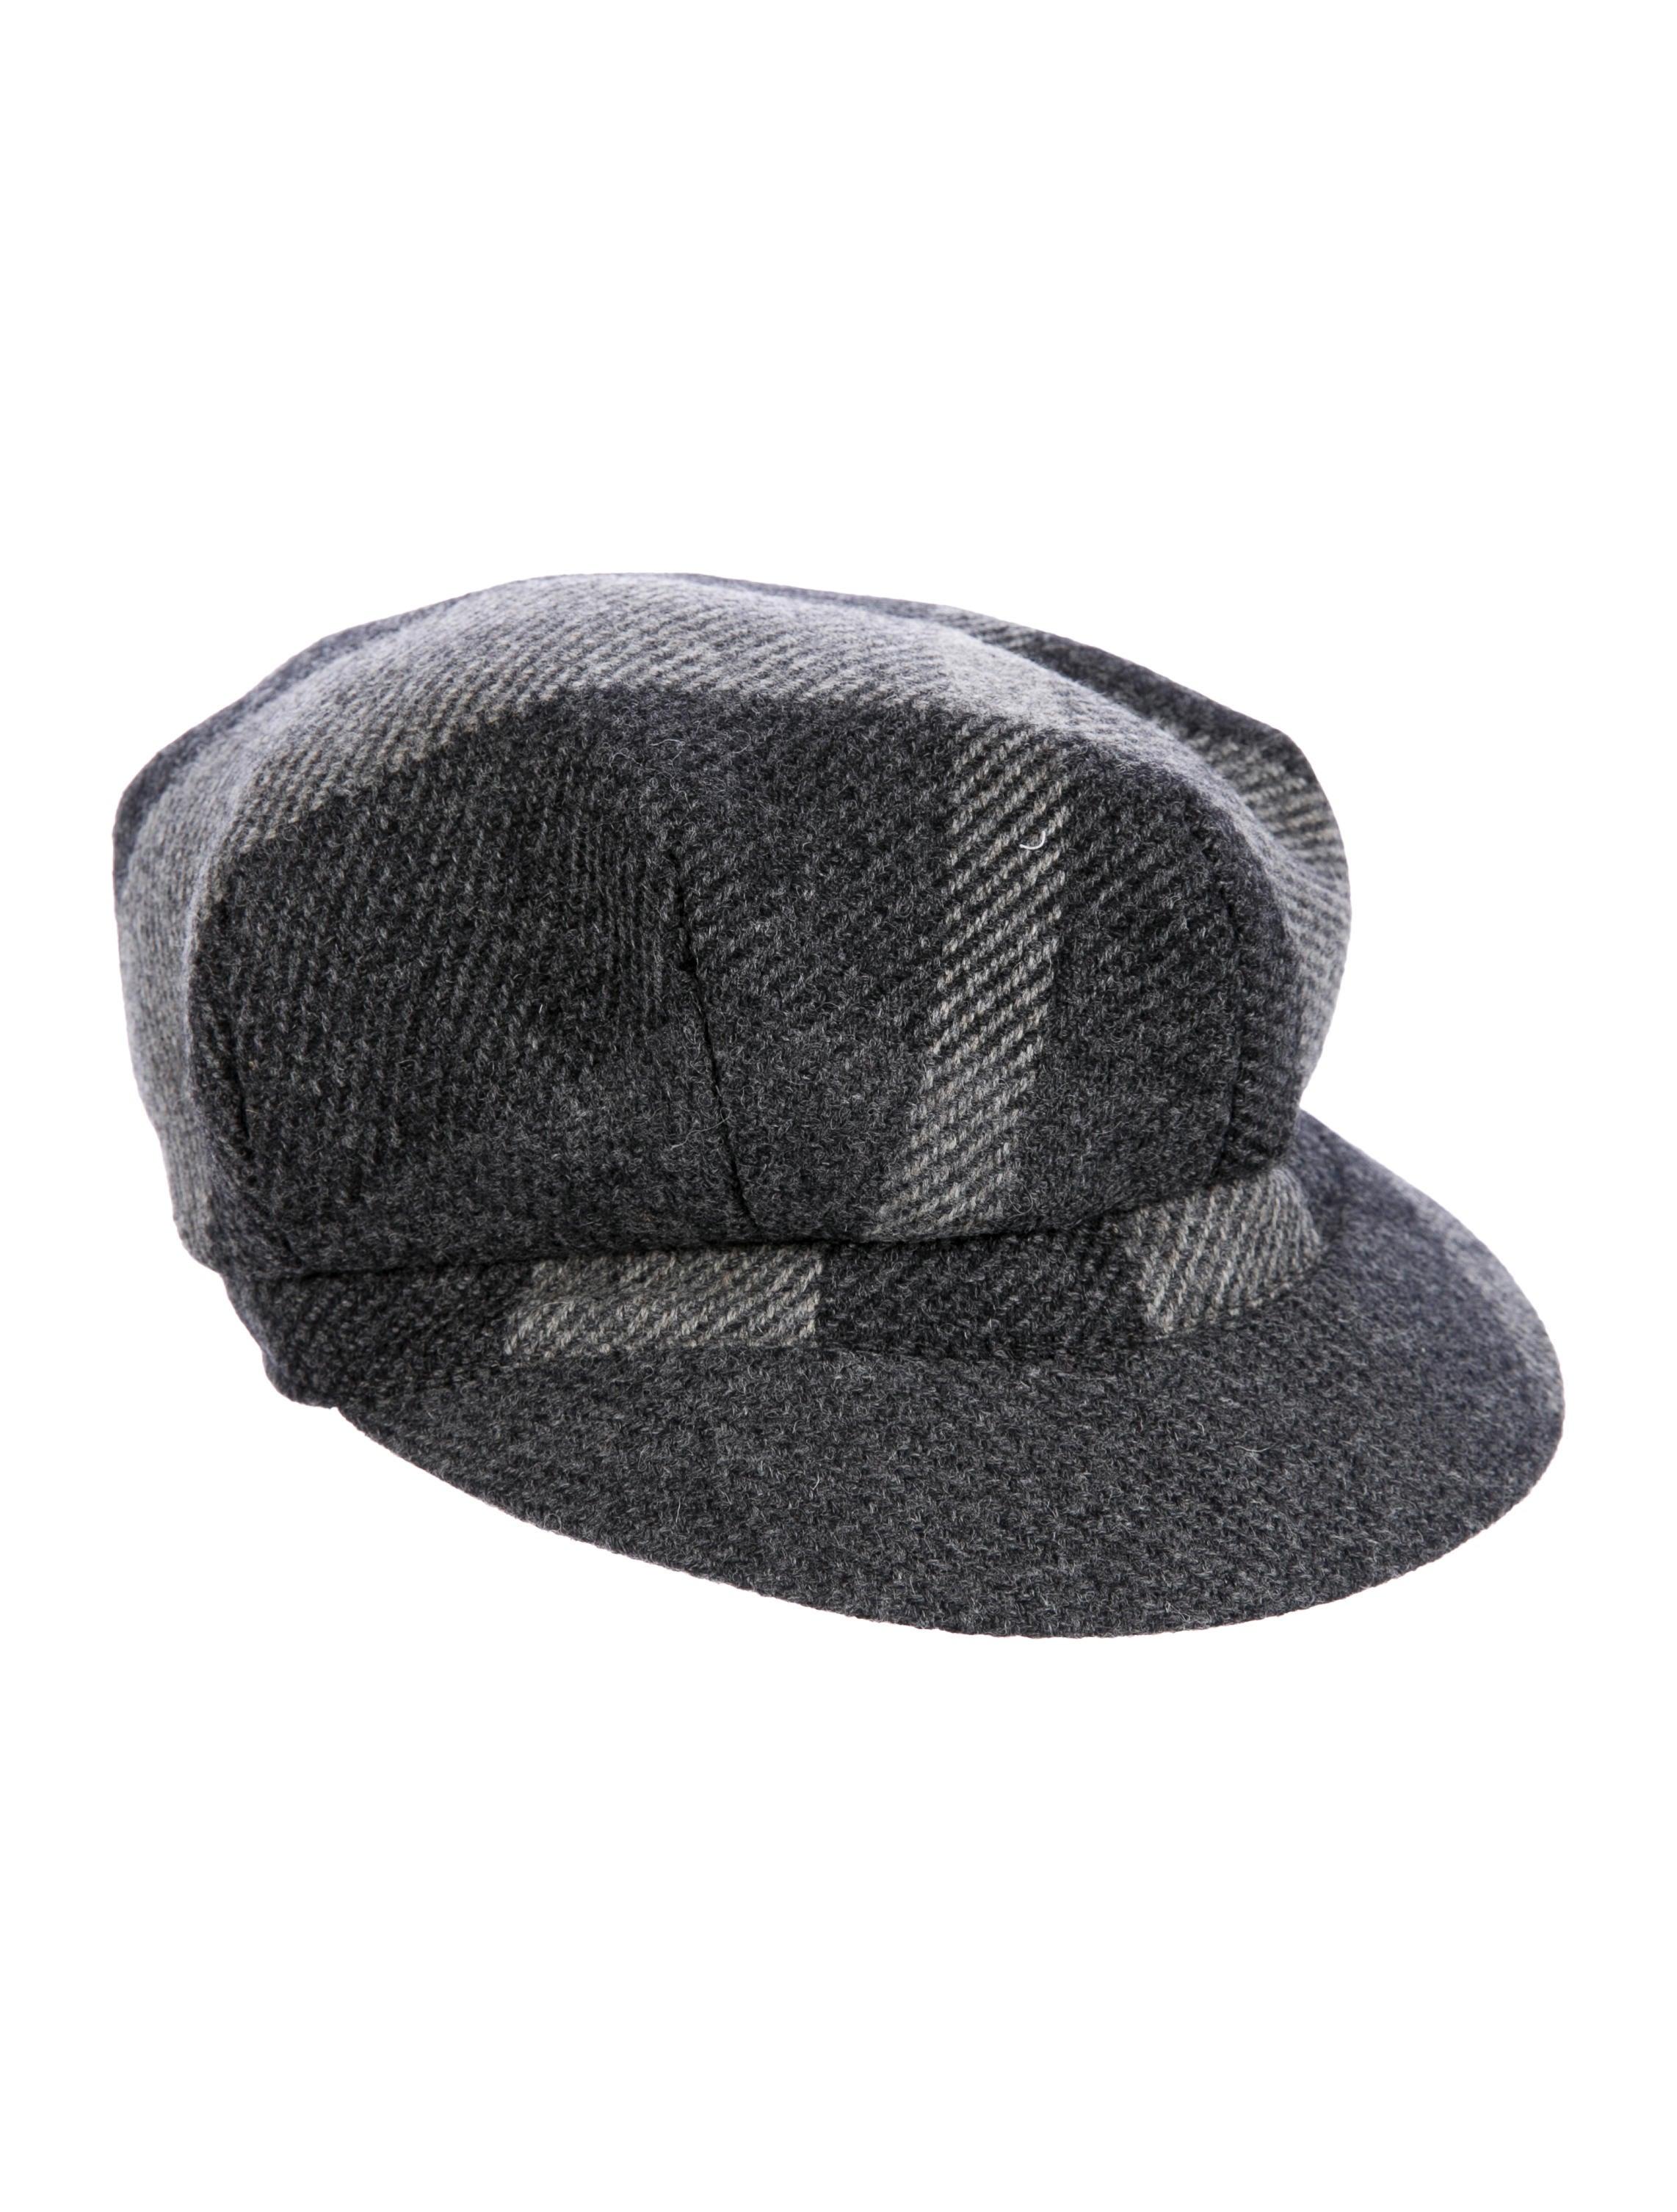 6b349094310 Burberry Beat Check Newsboy Hat - Accessories - BUR85095